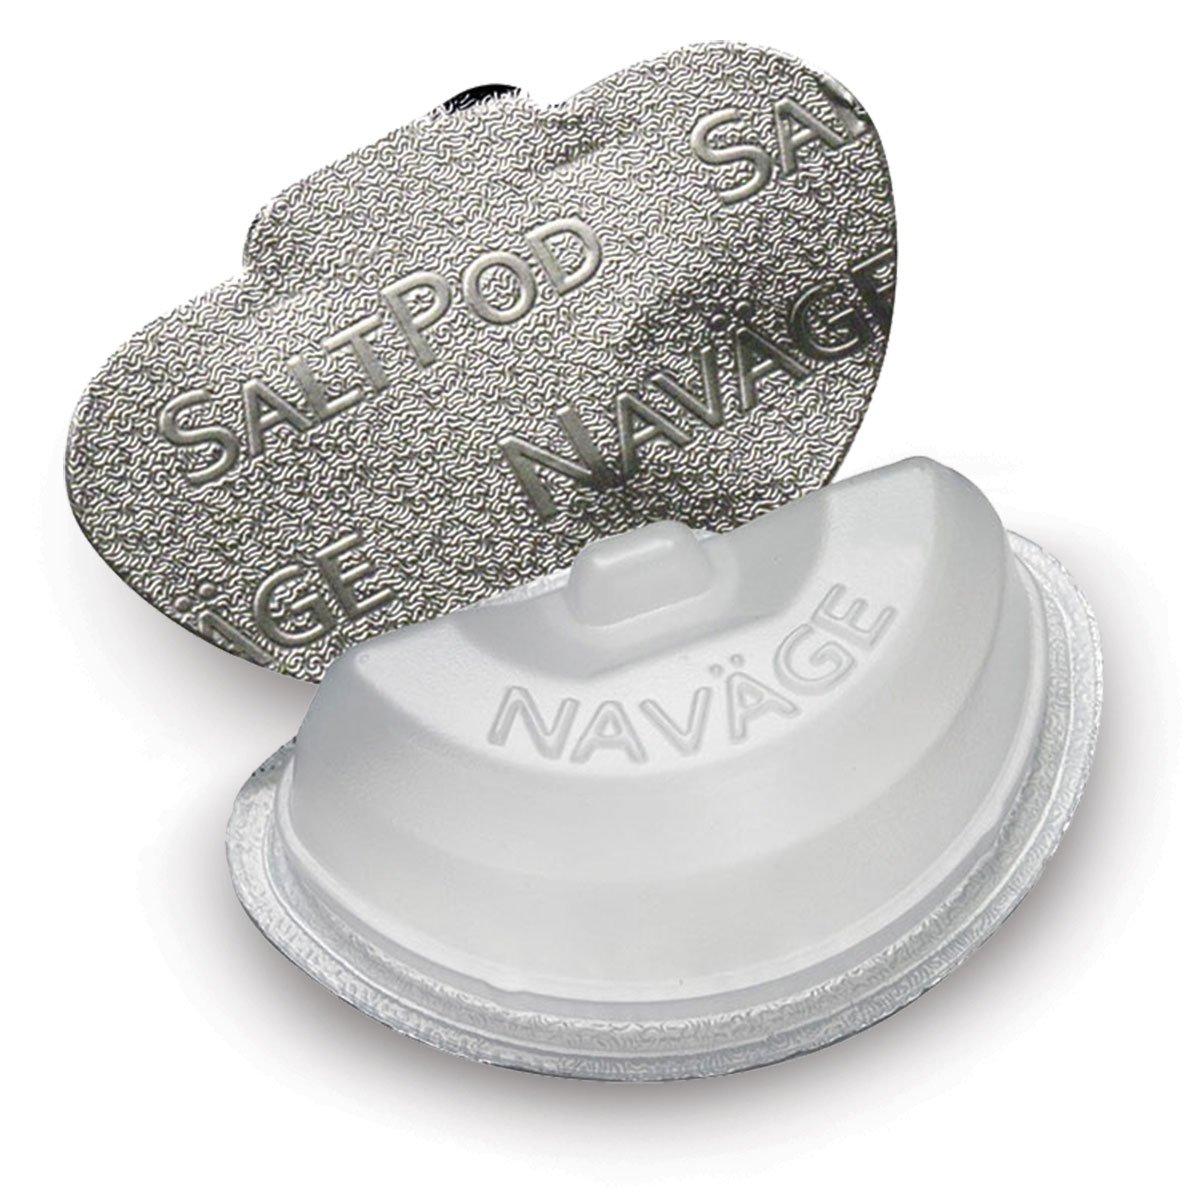 Naväge SaltPod Bundle: 6 SaltPod 30-Packs (180 SaltPods) $89.70 if purchased separately by Navage